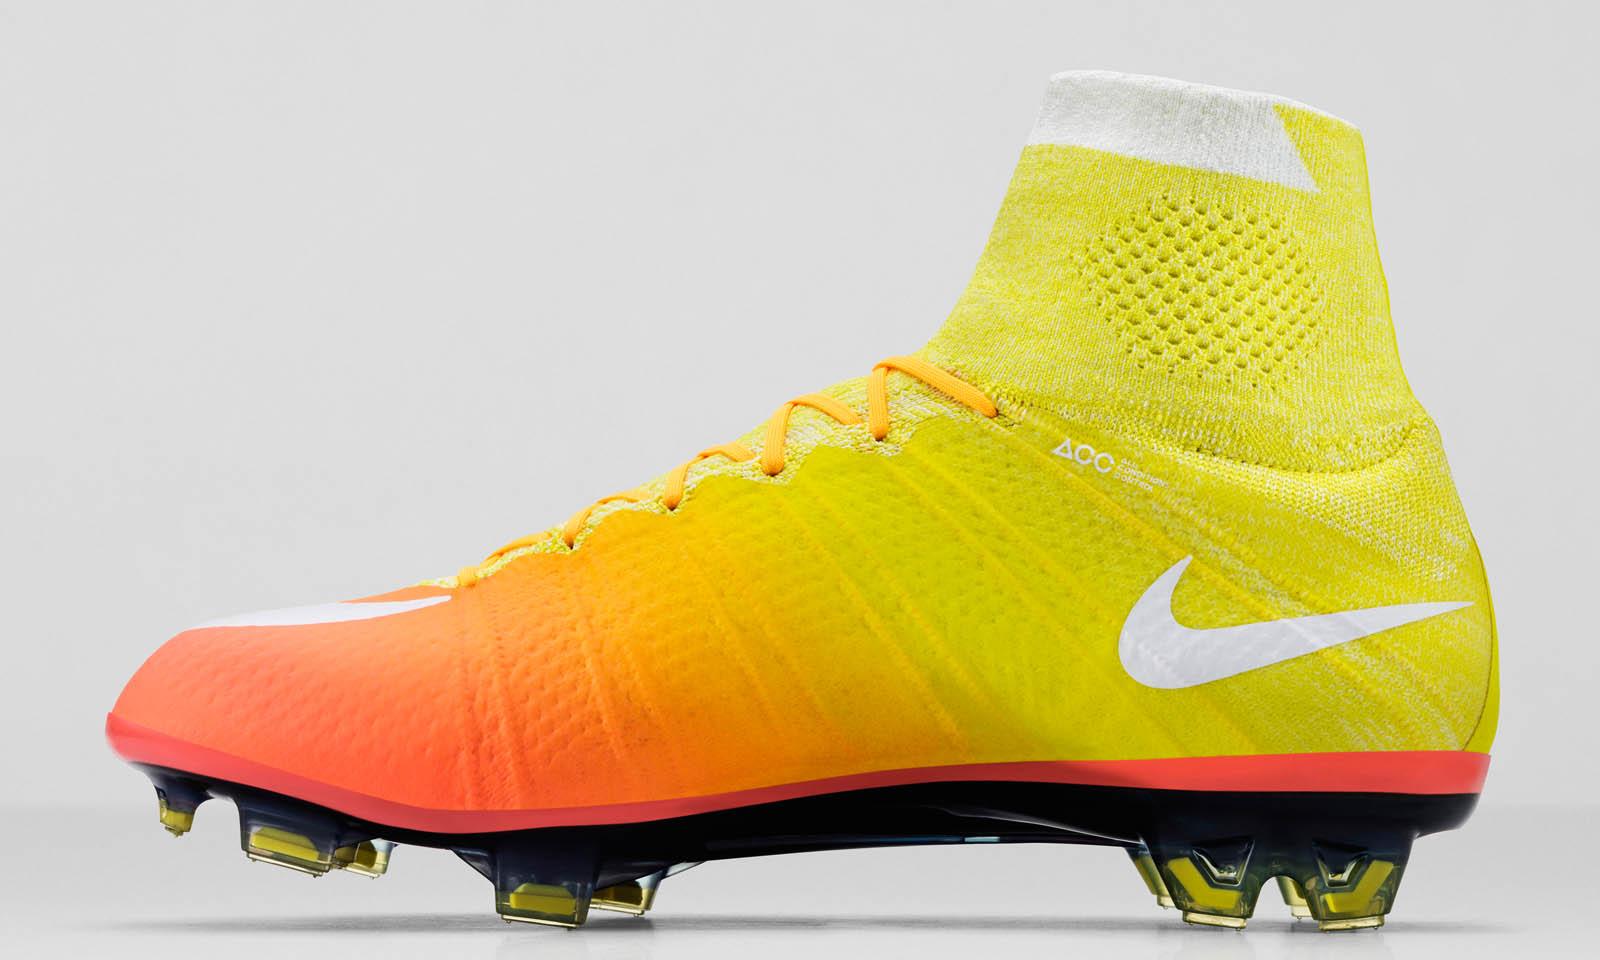 Nike Mercurial Superfly 2016 Radiant Reveal